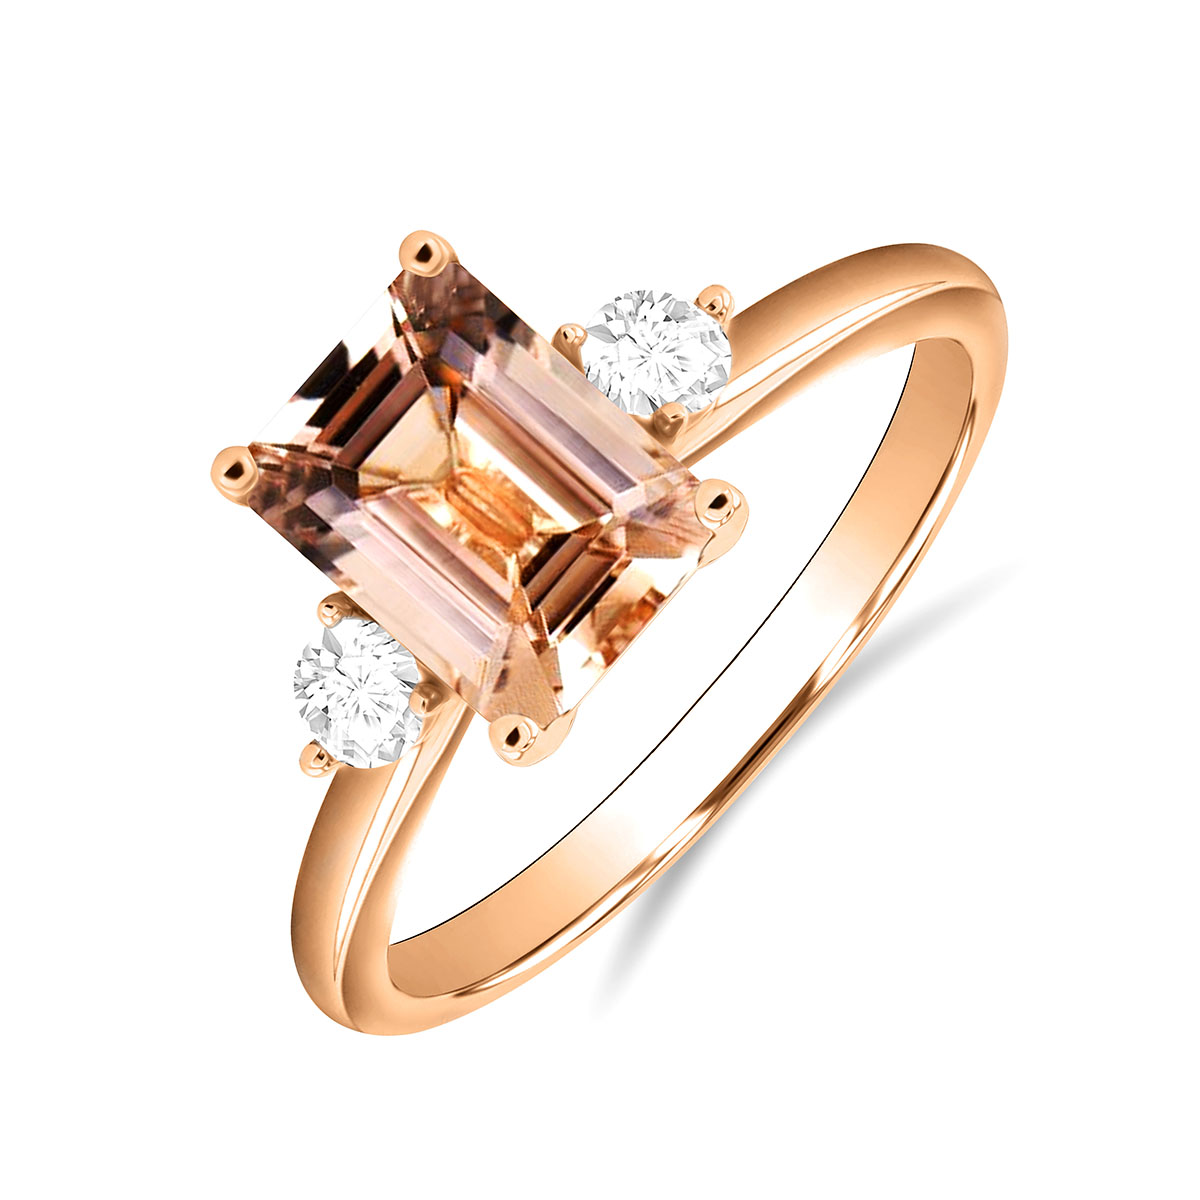 Rosa Mer Collection 1.28ct Morganite & Diamond Trilogy Ring | 18K Rose Gold